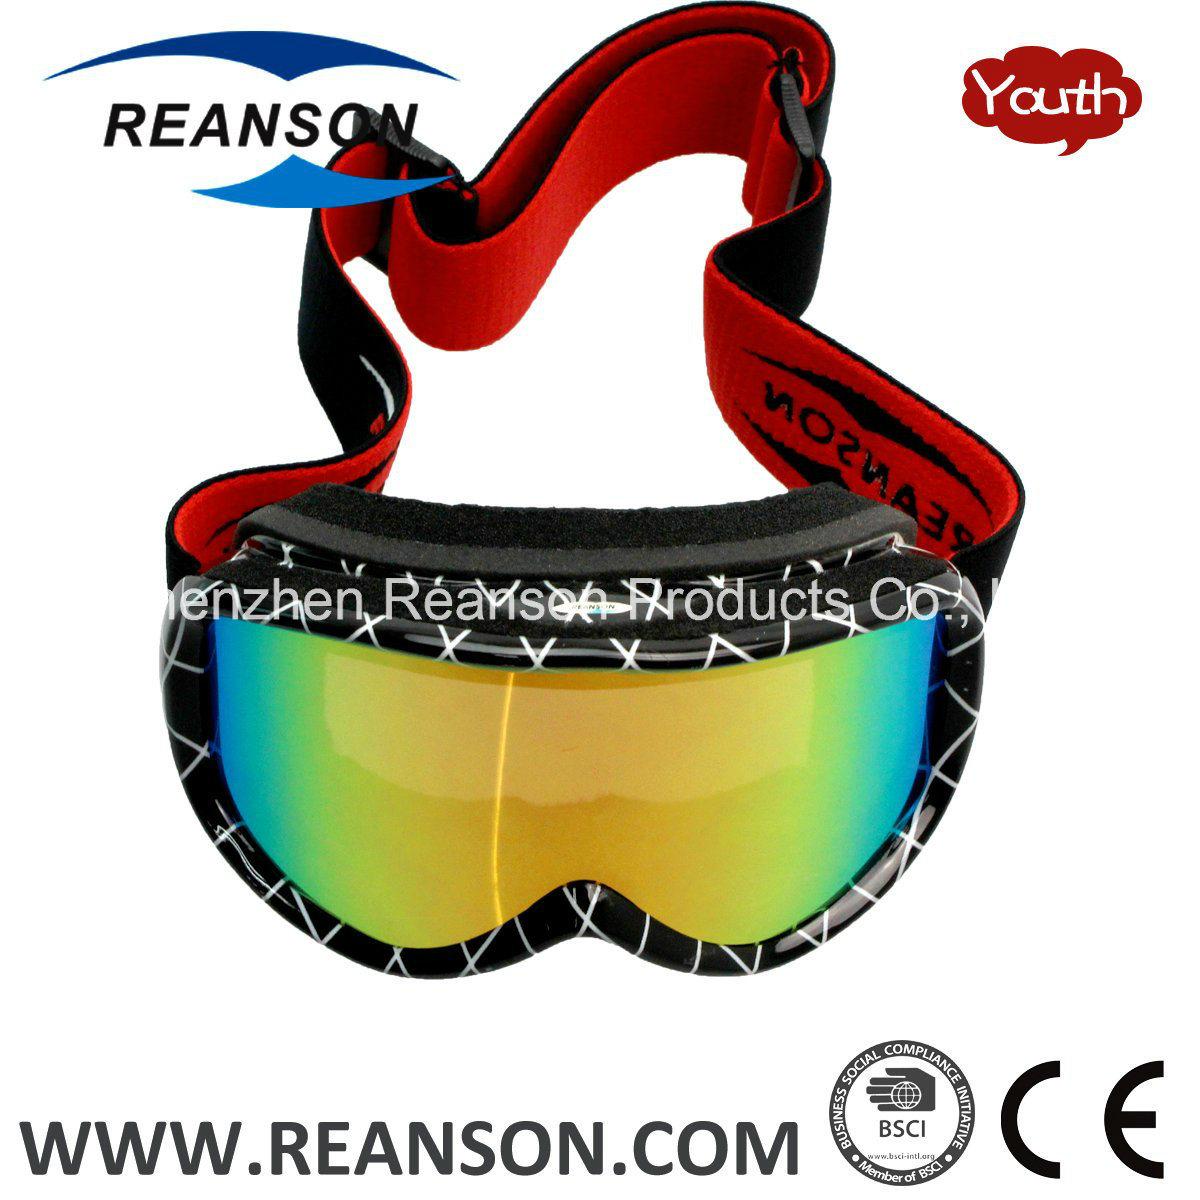 Reanson Youth Double Lenses Anti-Fog UV Protection Ski Goggles